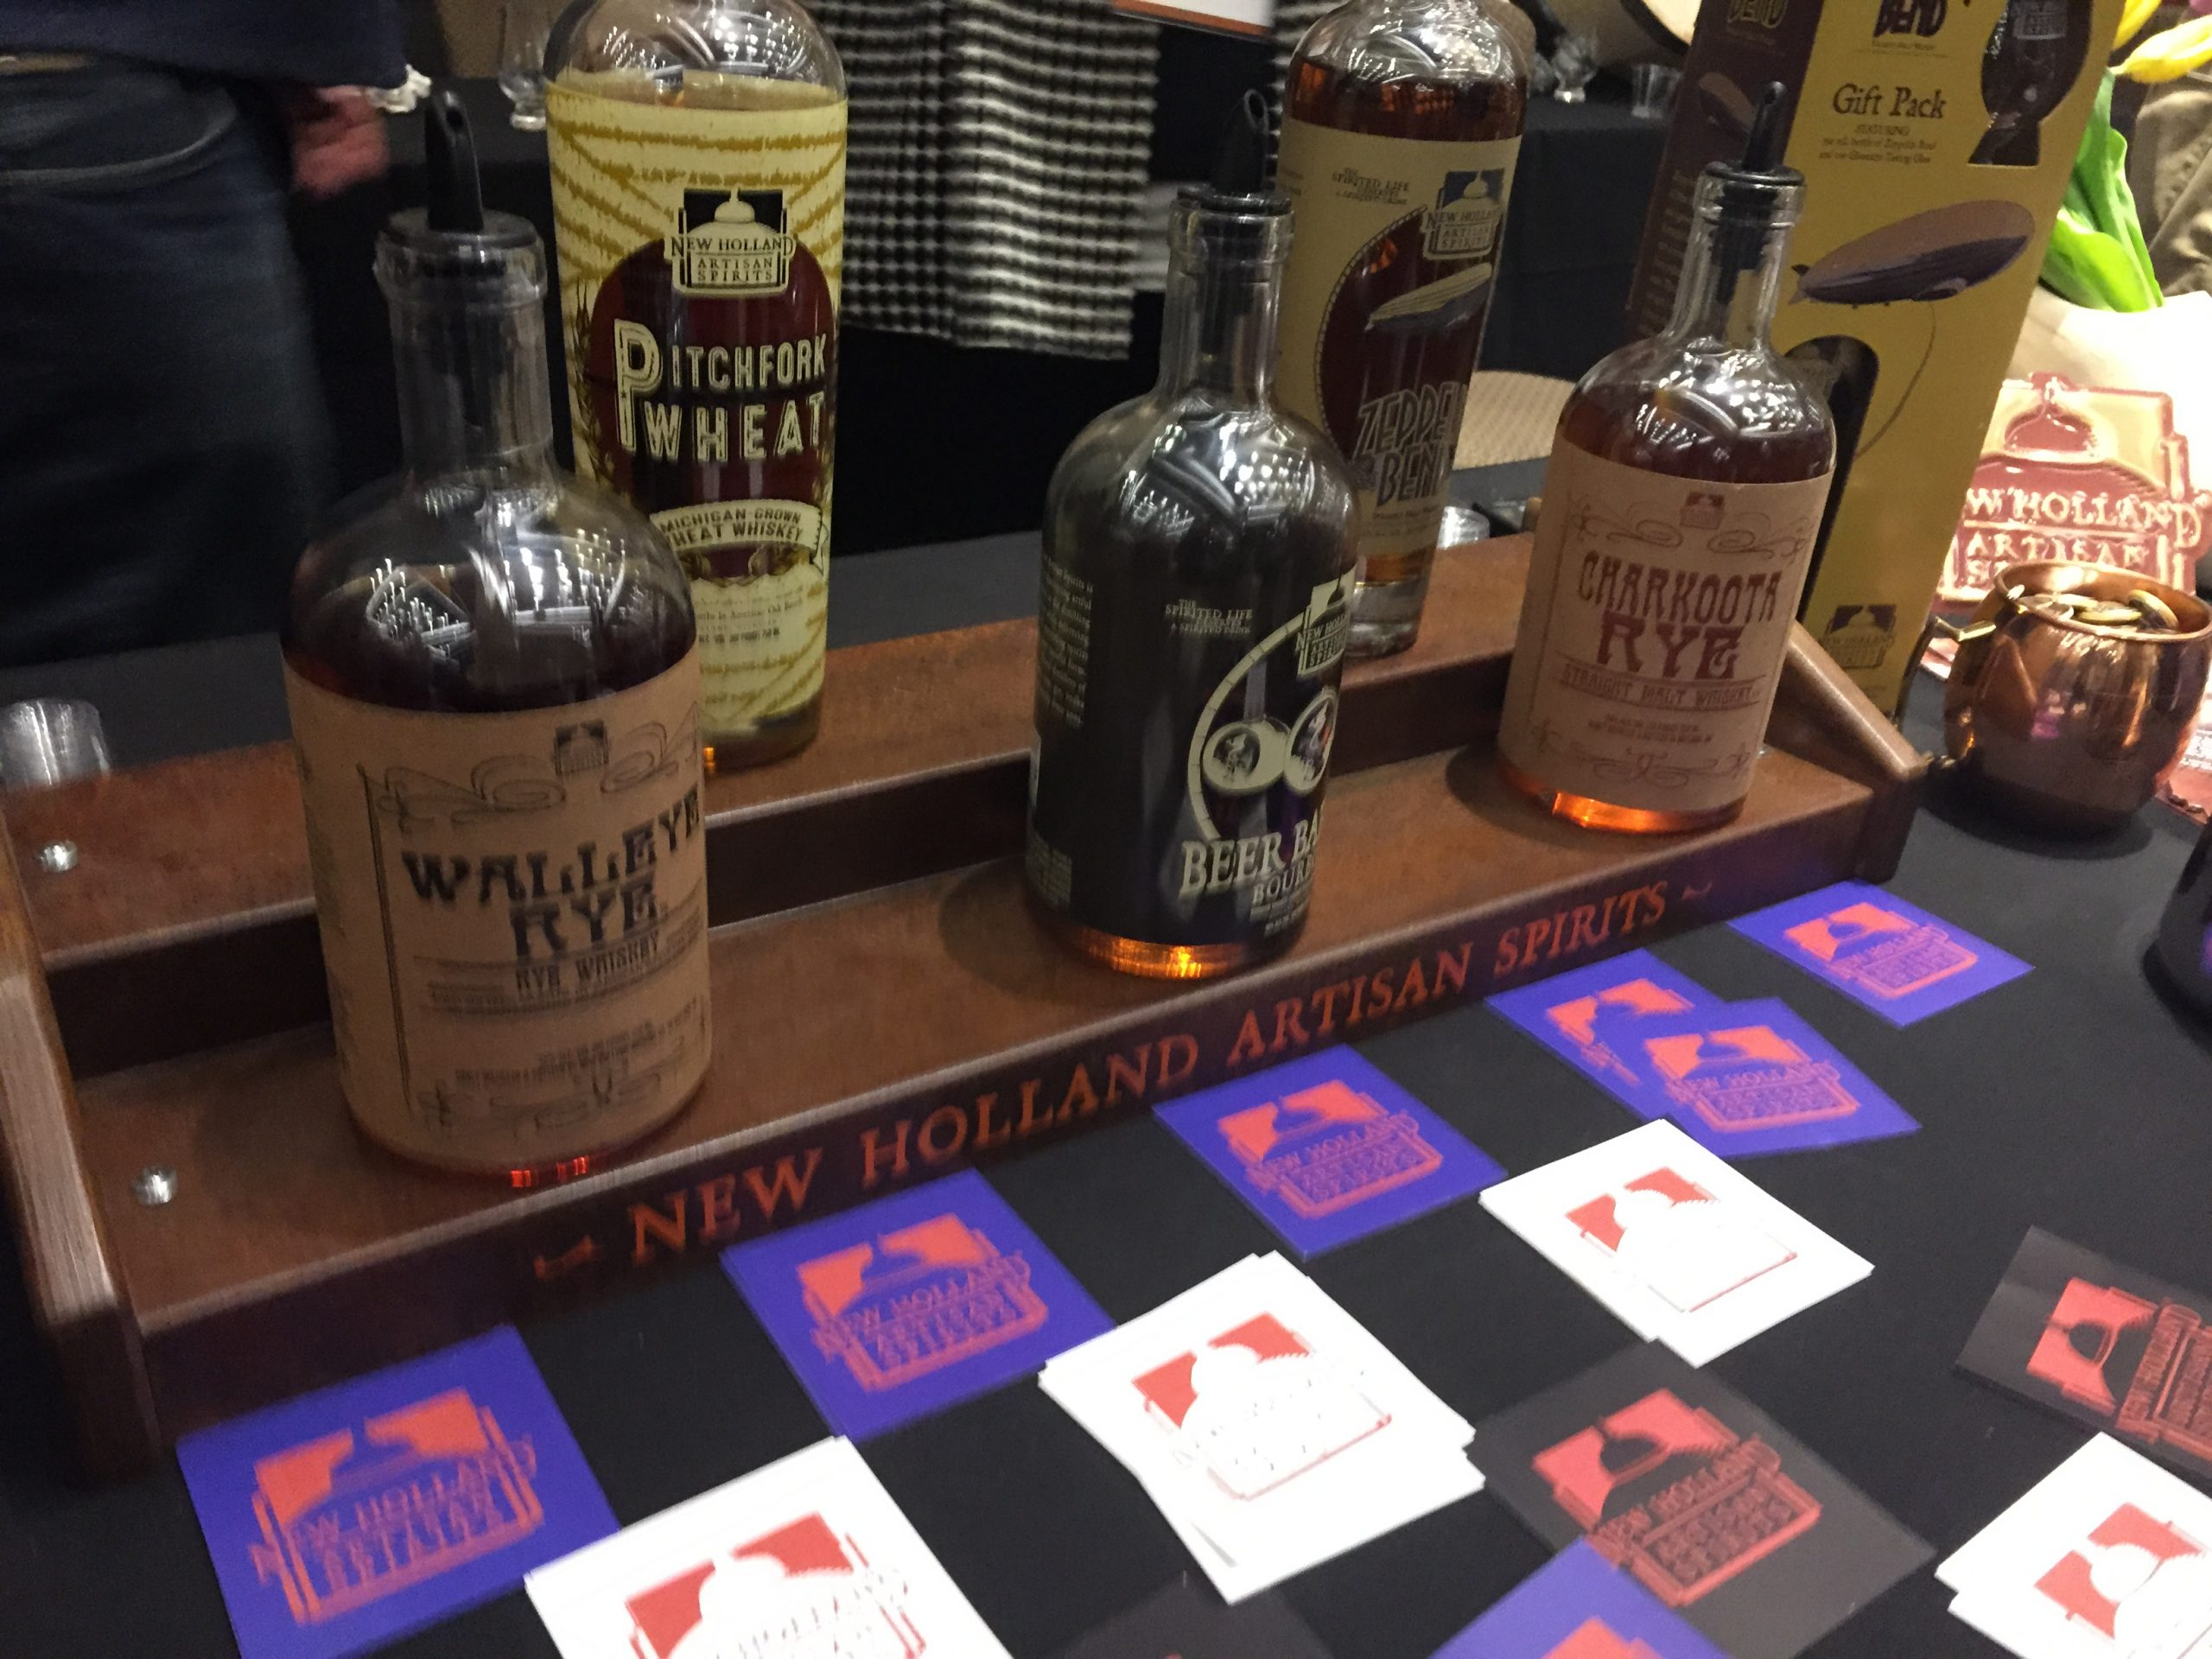 New Holland's whiskeys